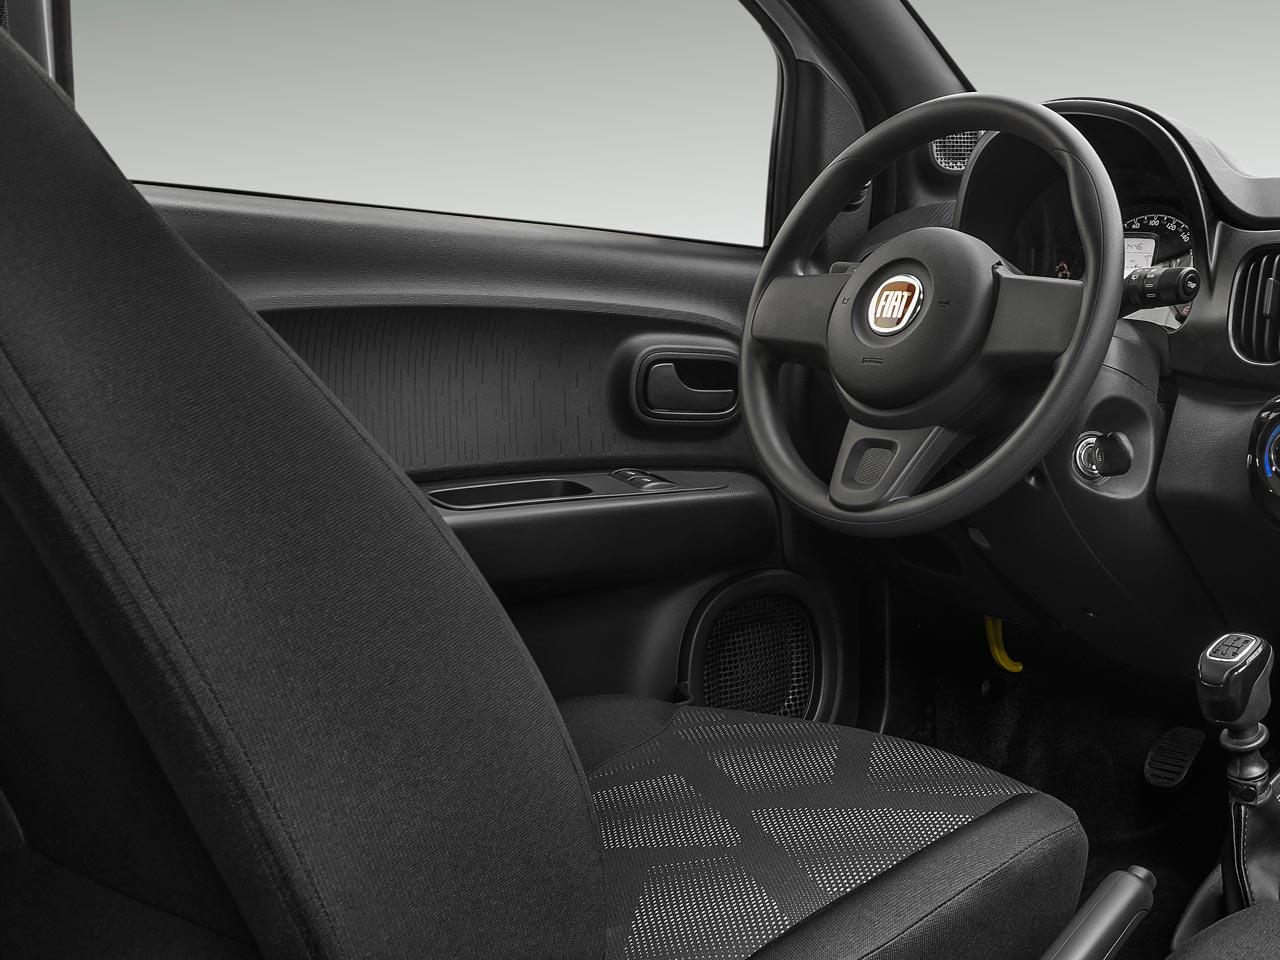 Interior Fiat Mobi VeloCITY